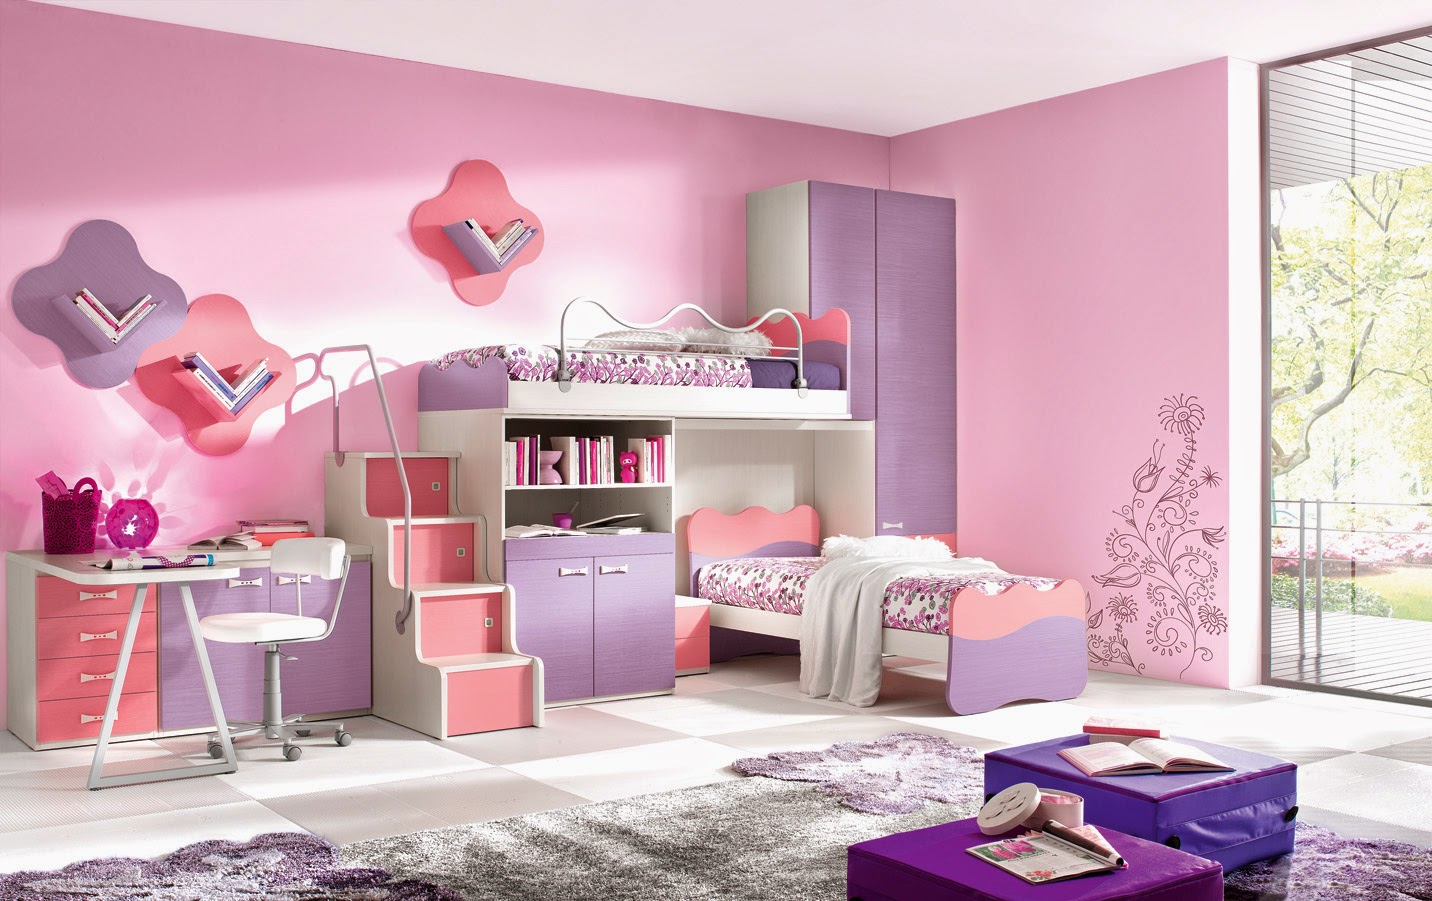 desain interior kamar anak perempuan hello kitty sederhana